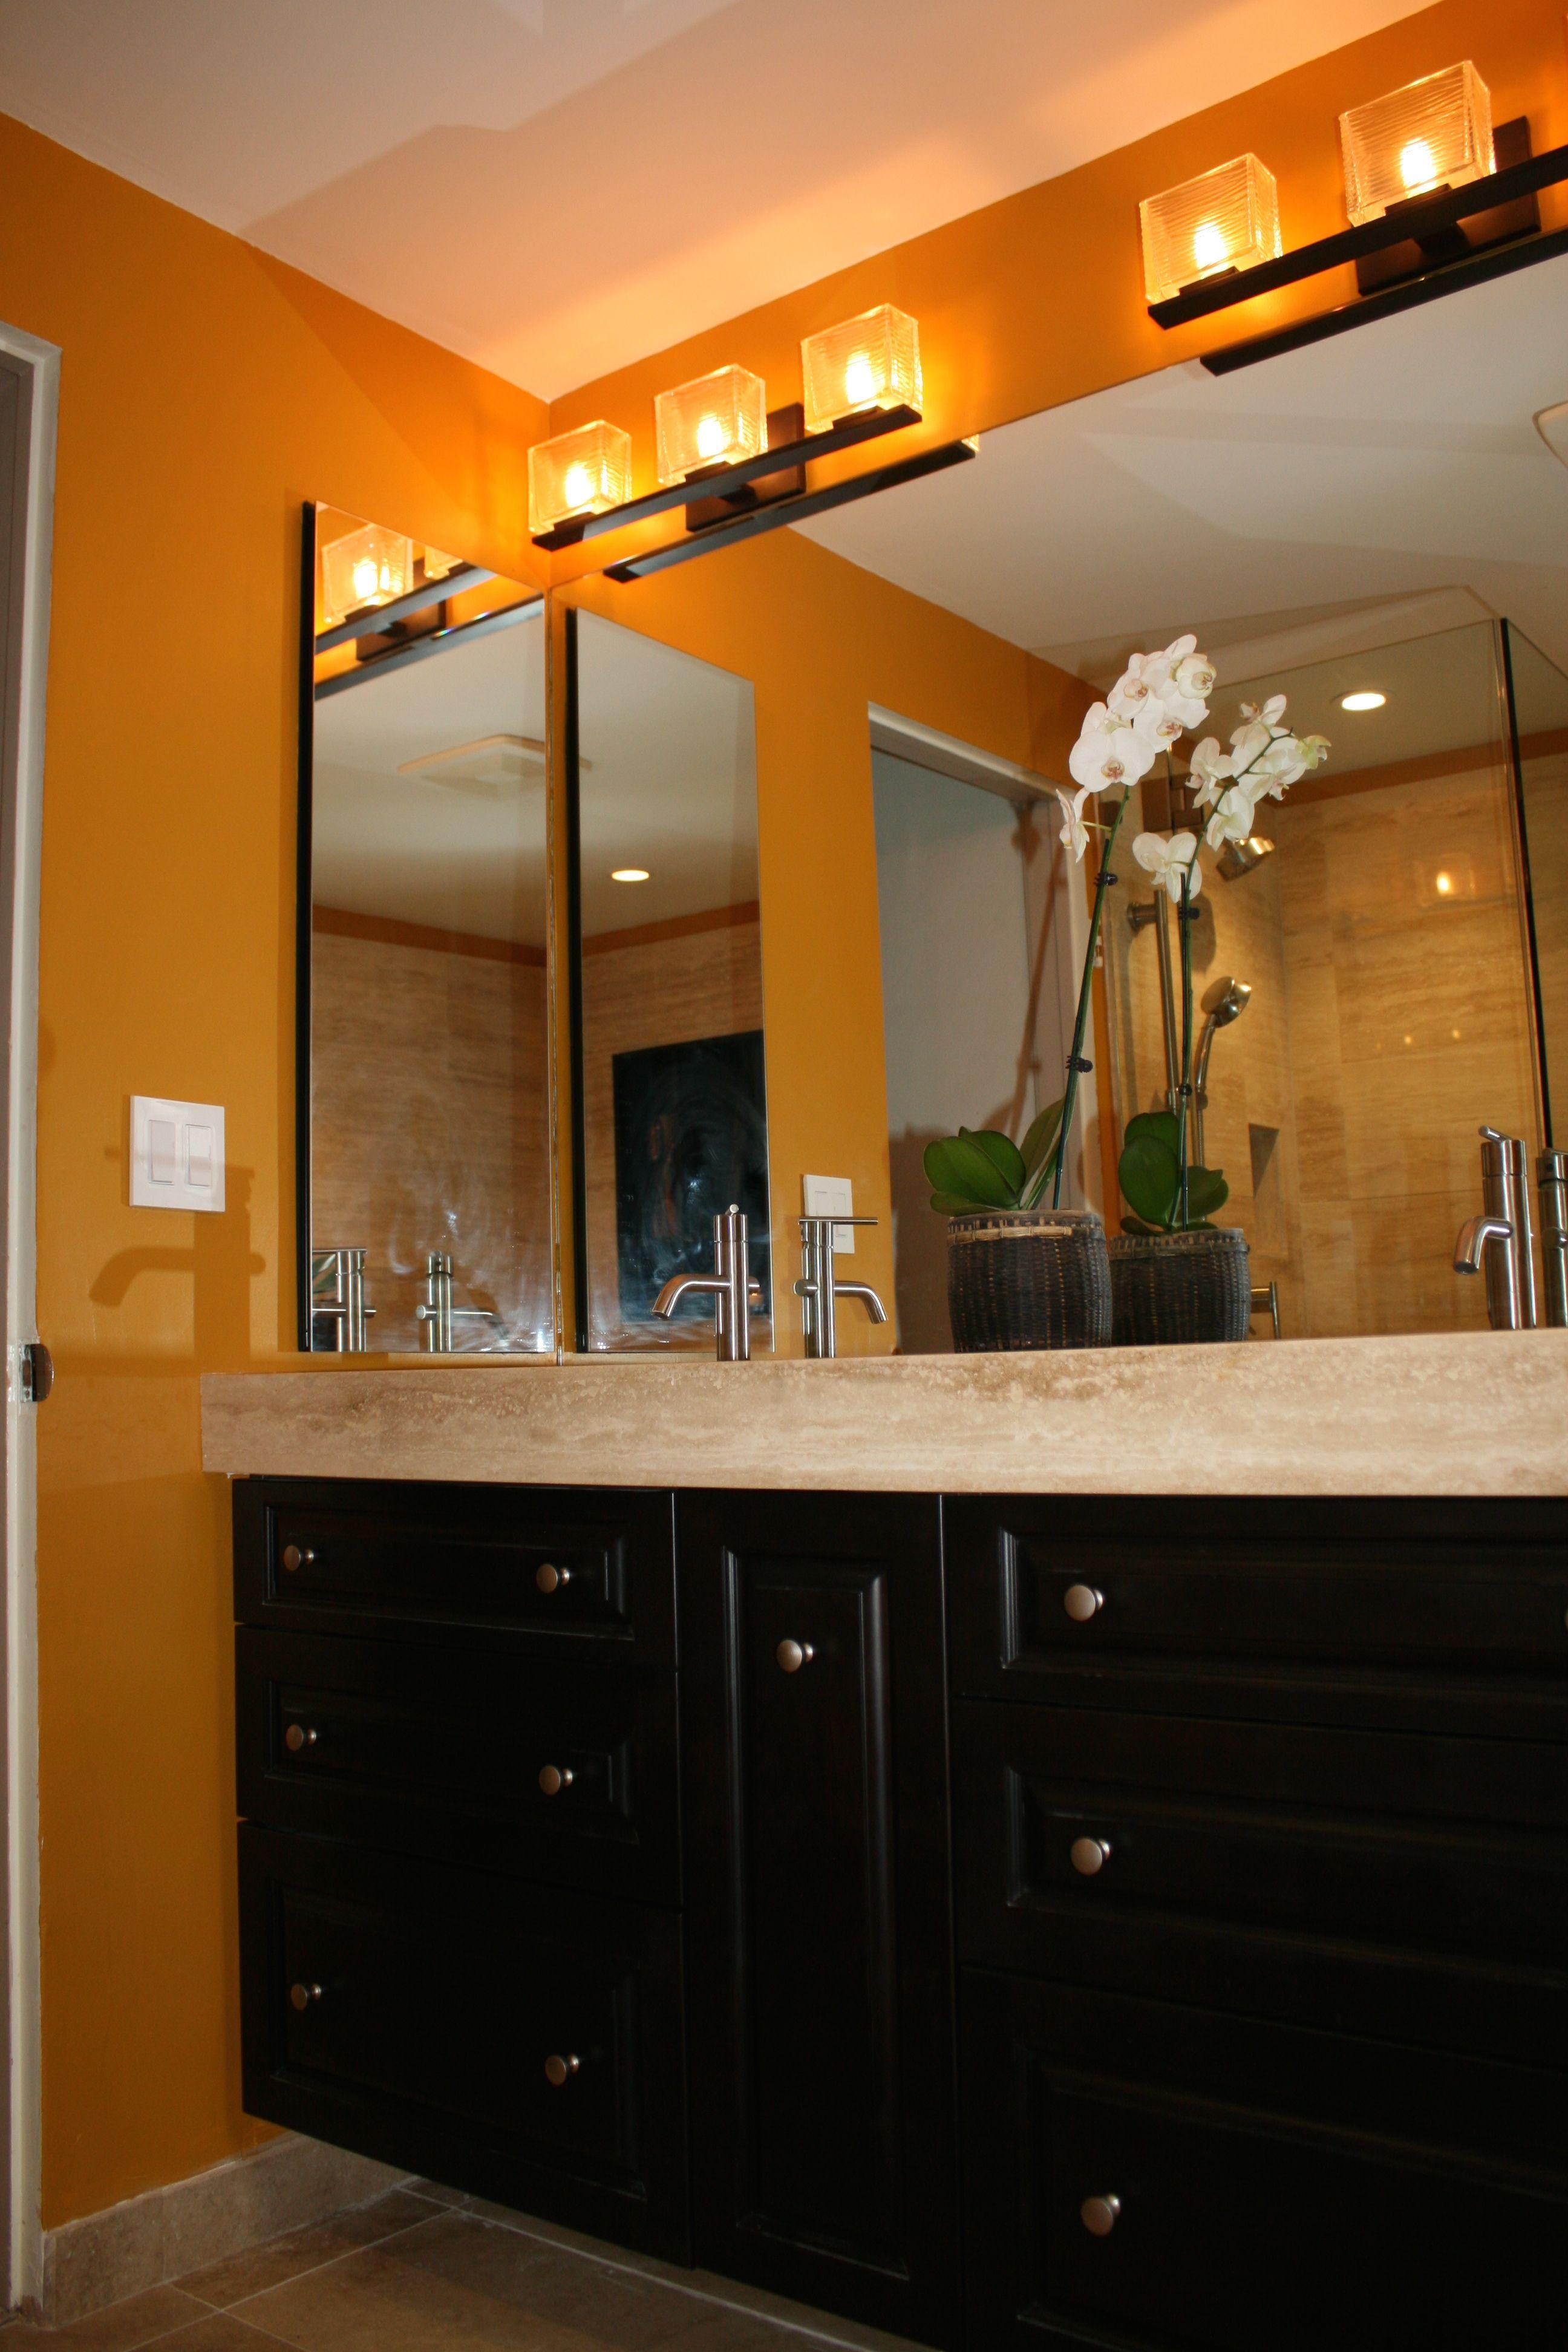 African Inspired Bath Lighted Bathroom Mirror Bathroom Mirror Bathroom Lighting African inspired bathroom decor